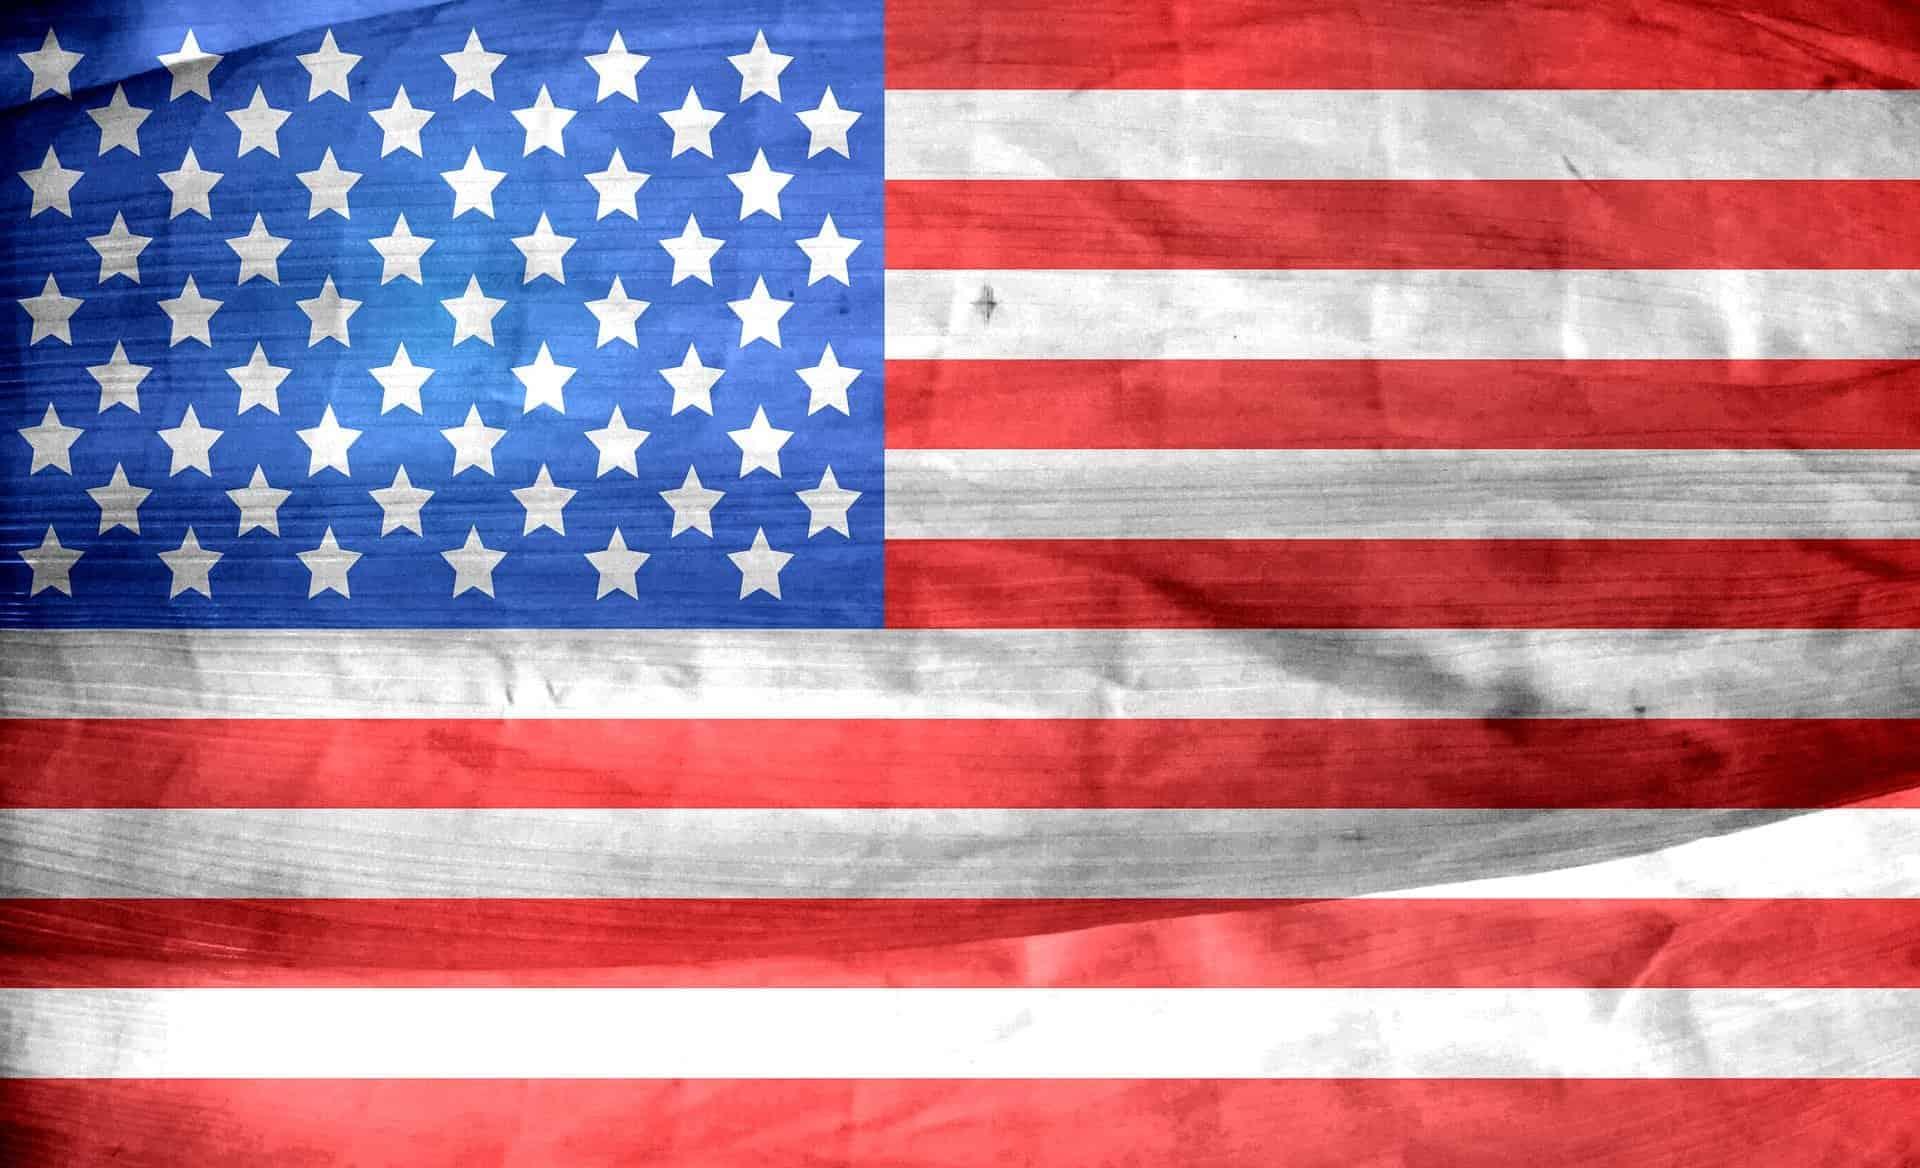 https://www.tranpak.com/wp-content/uploads/2020/05/american-flag.jpg